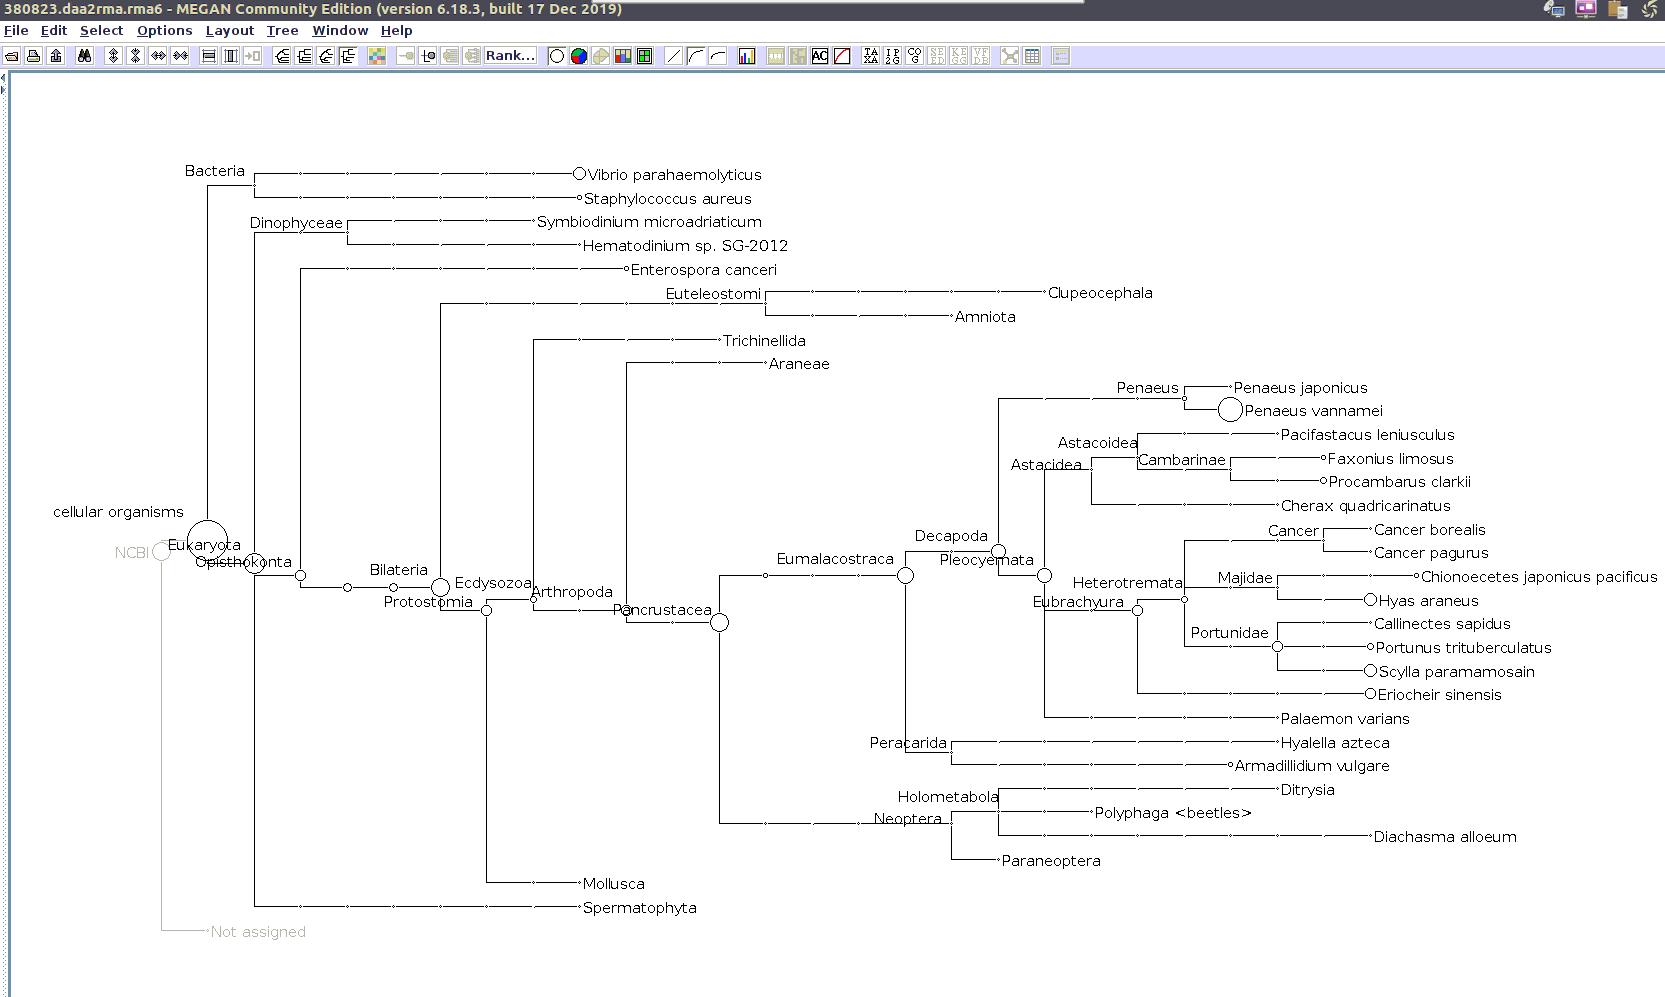 (MEGAN taxonomic tree for 380823